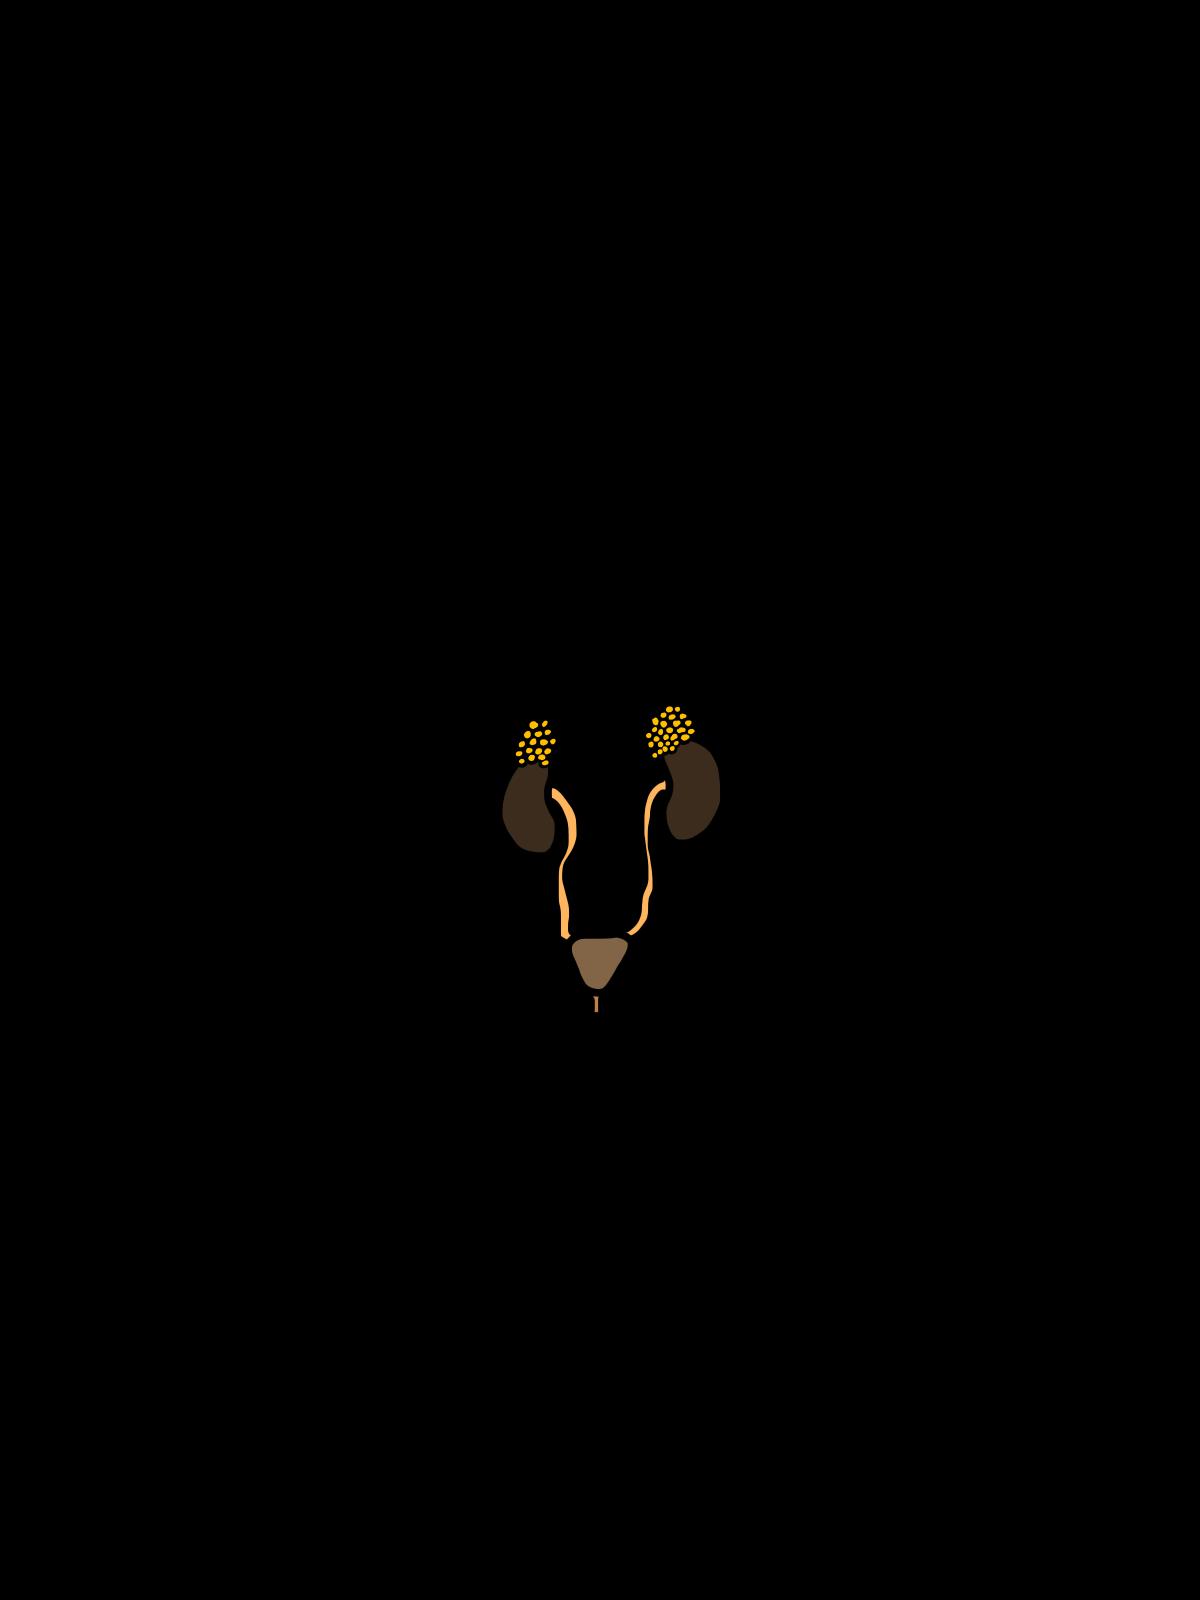 free urinary cliparts  download free clip art  free clip